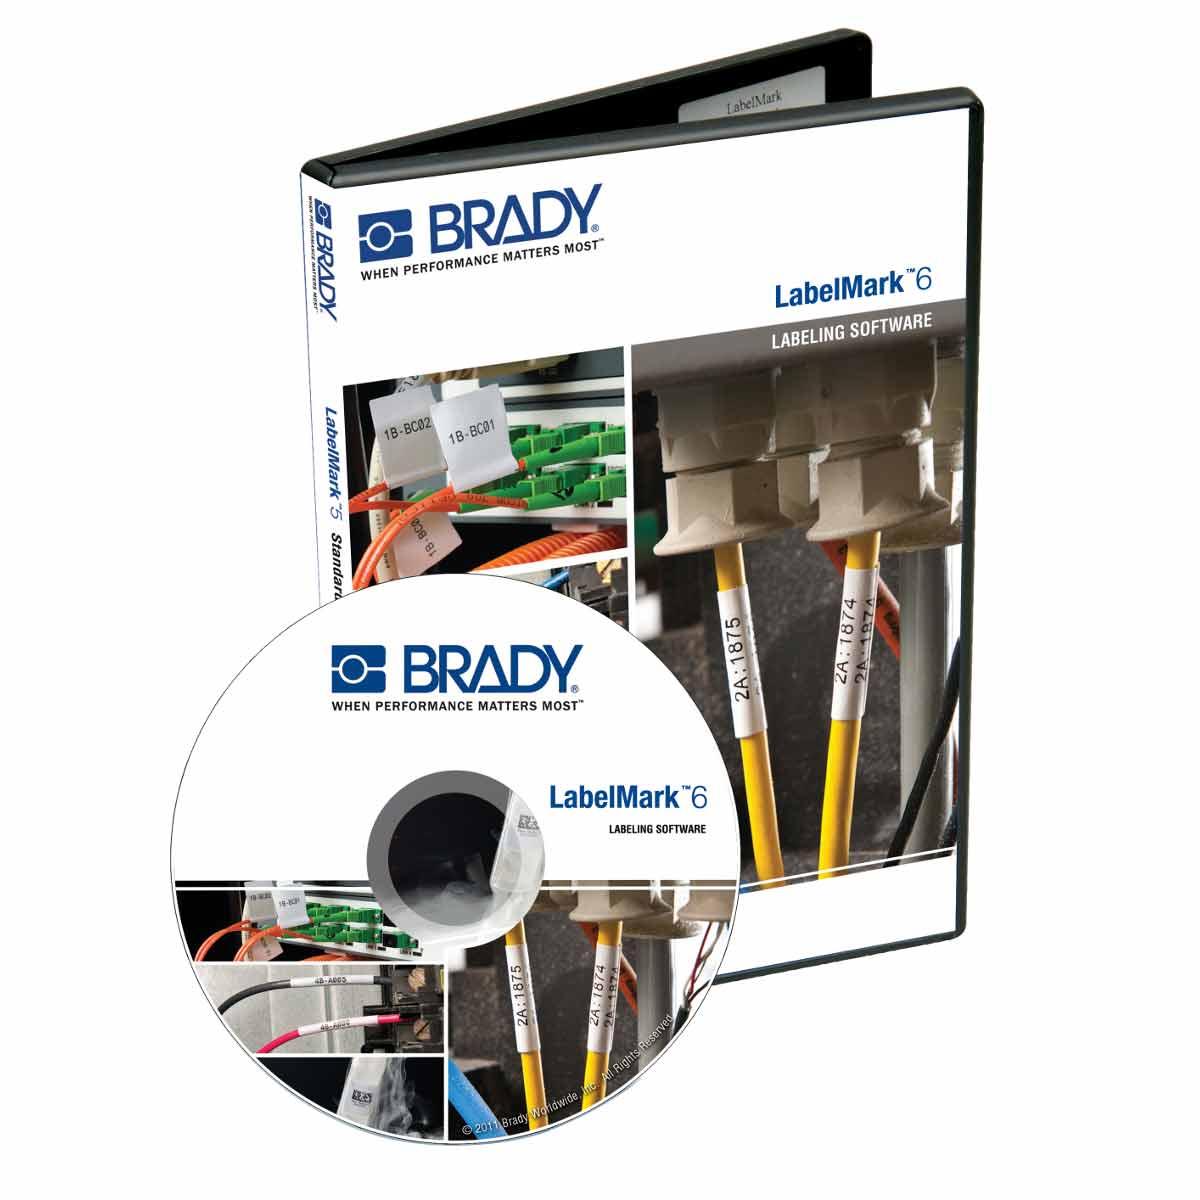 Brady® BWS-DA-CD Data Automation, CD Media, Operating System Compatibility: Brady® BBP11, BBP12 and BBP30 Printers, Windows 10, Windows 7 Professional, Ultimate, Enterprise, Windows 8.1 Professional, Enterprise, 1.5 Ghz Processor, 2 GB RAM